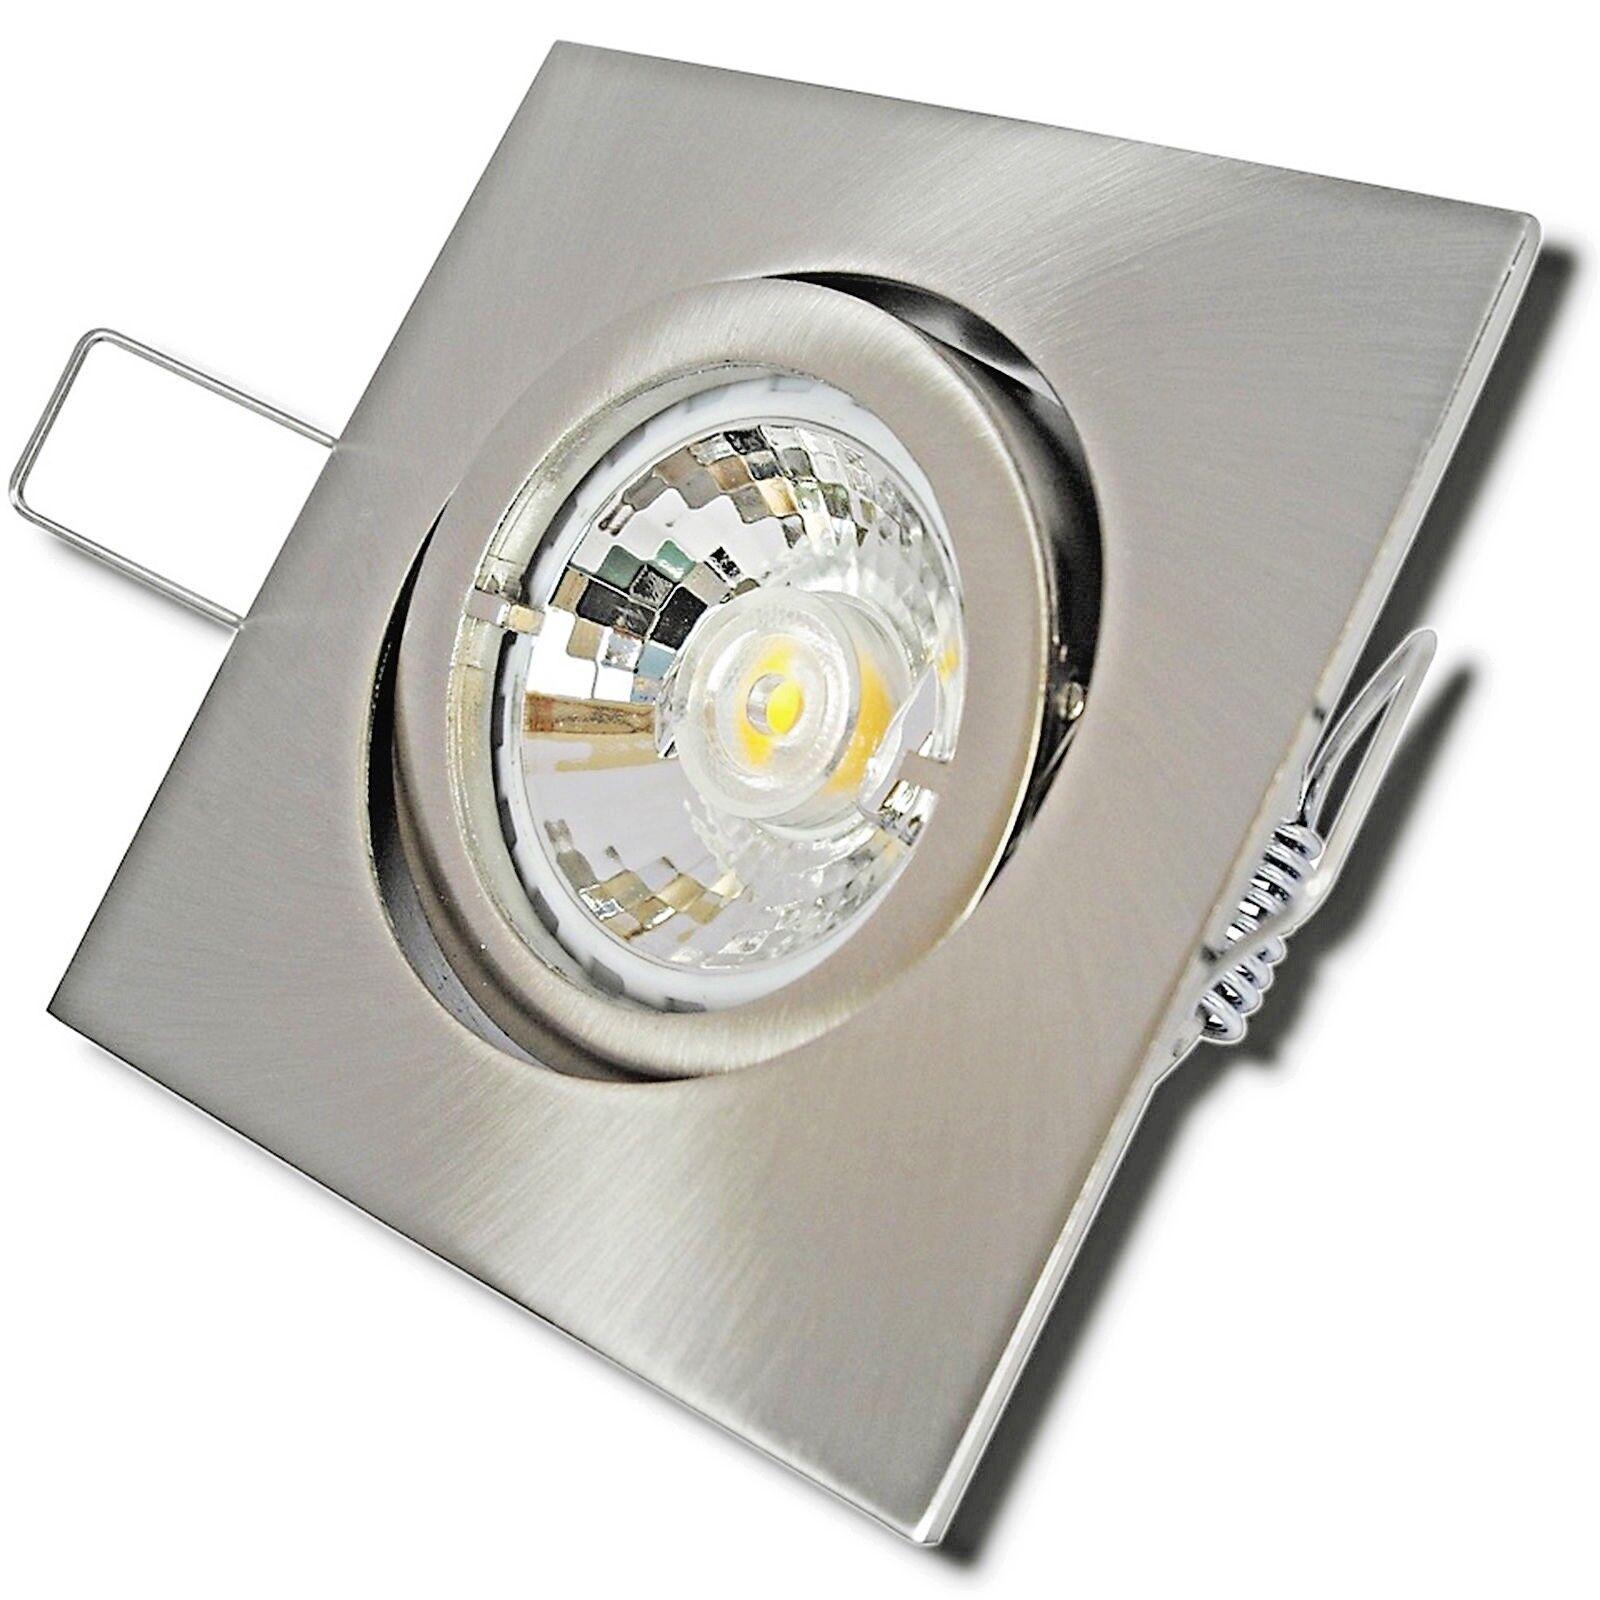 Sets Einbauspots LED Dimmbar 230V Einbauleuchten 7W=52W Kein LEDTrafo nötig Gu10